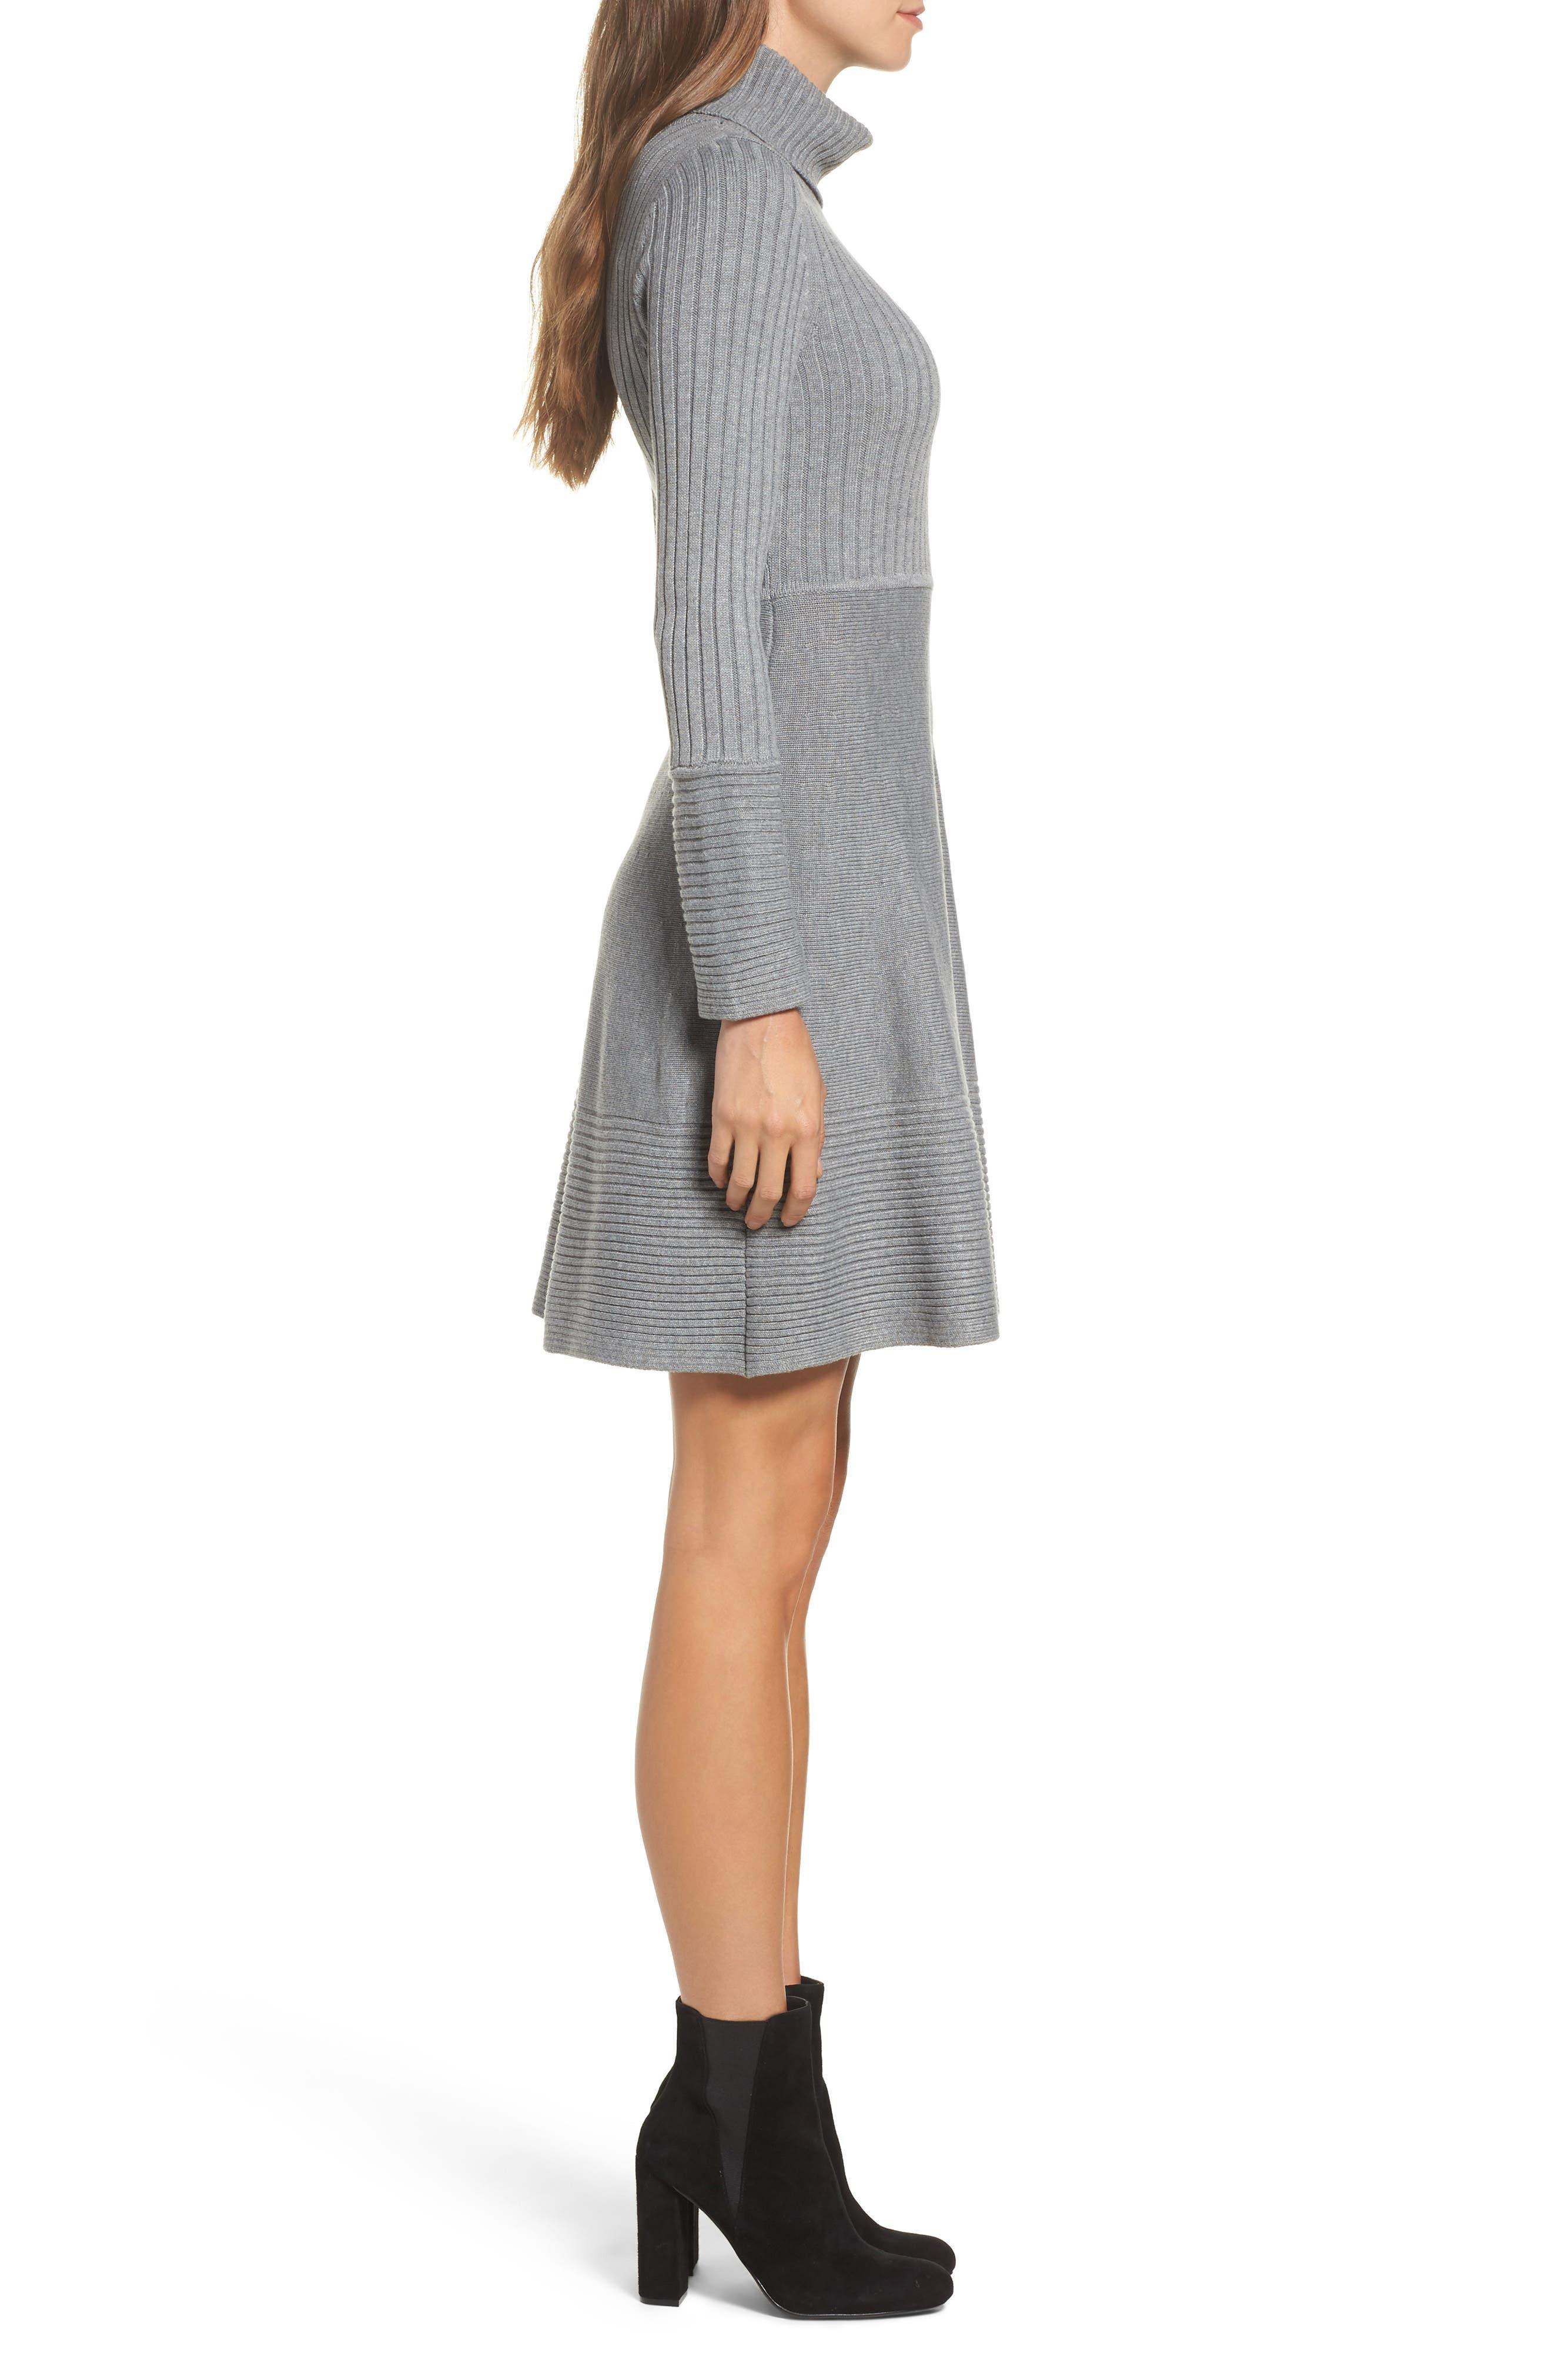 ELIZA J, Turtleneck Sweater Dress, Alternate thumbnail 4, color, GREY